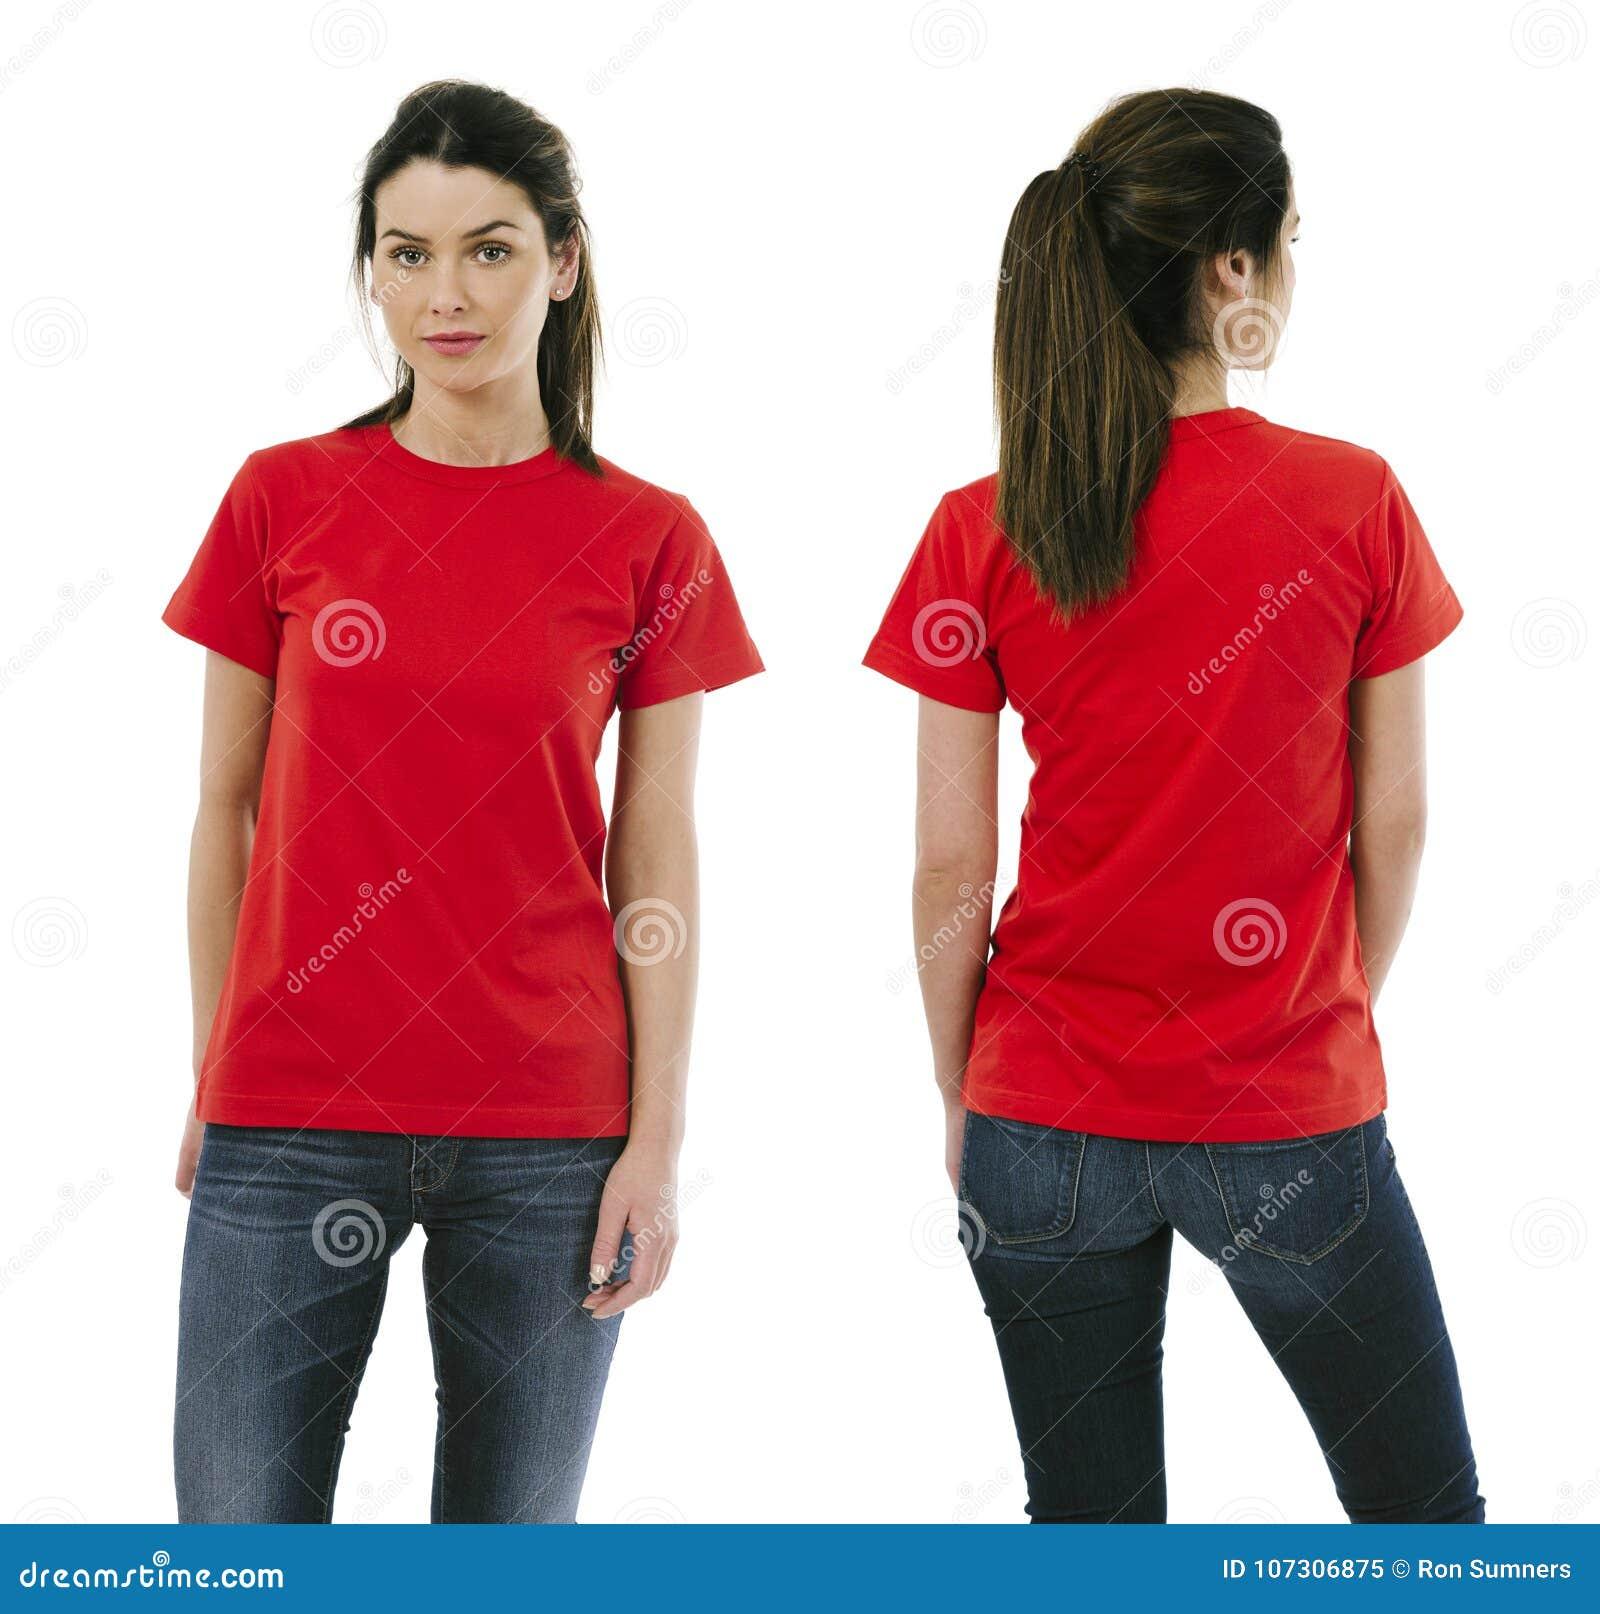 Brunette woman wearing blank red shirt